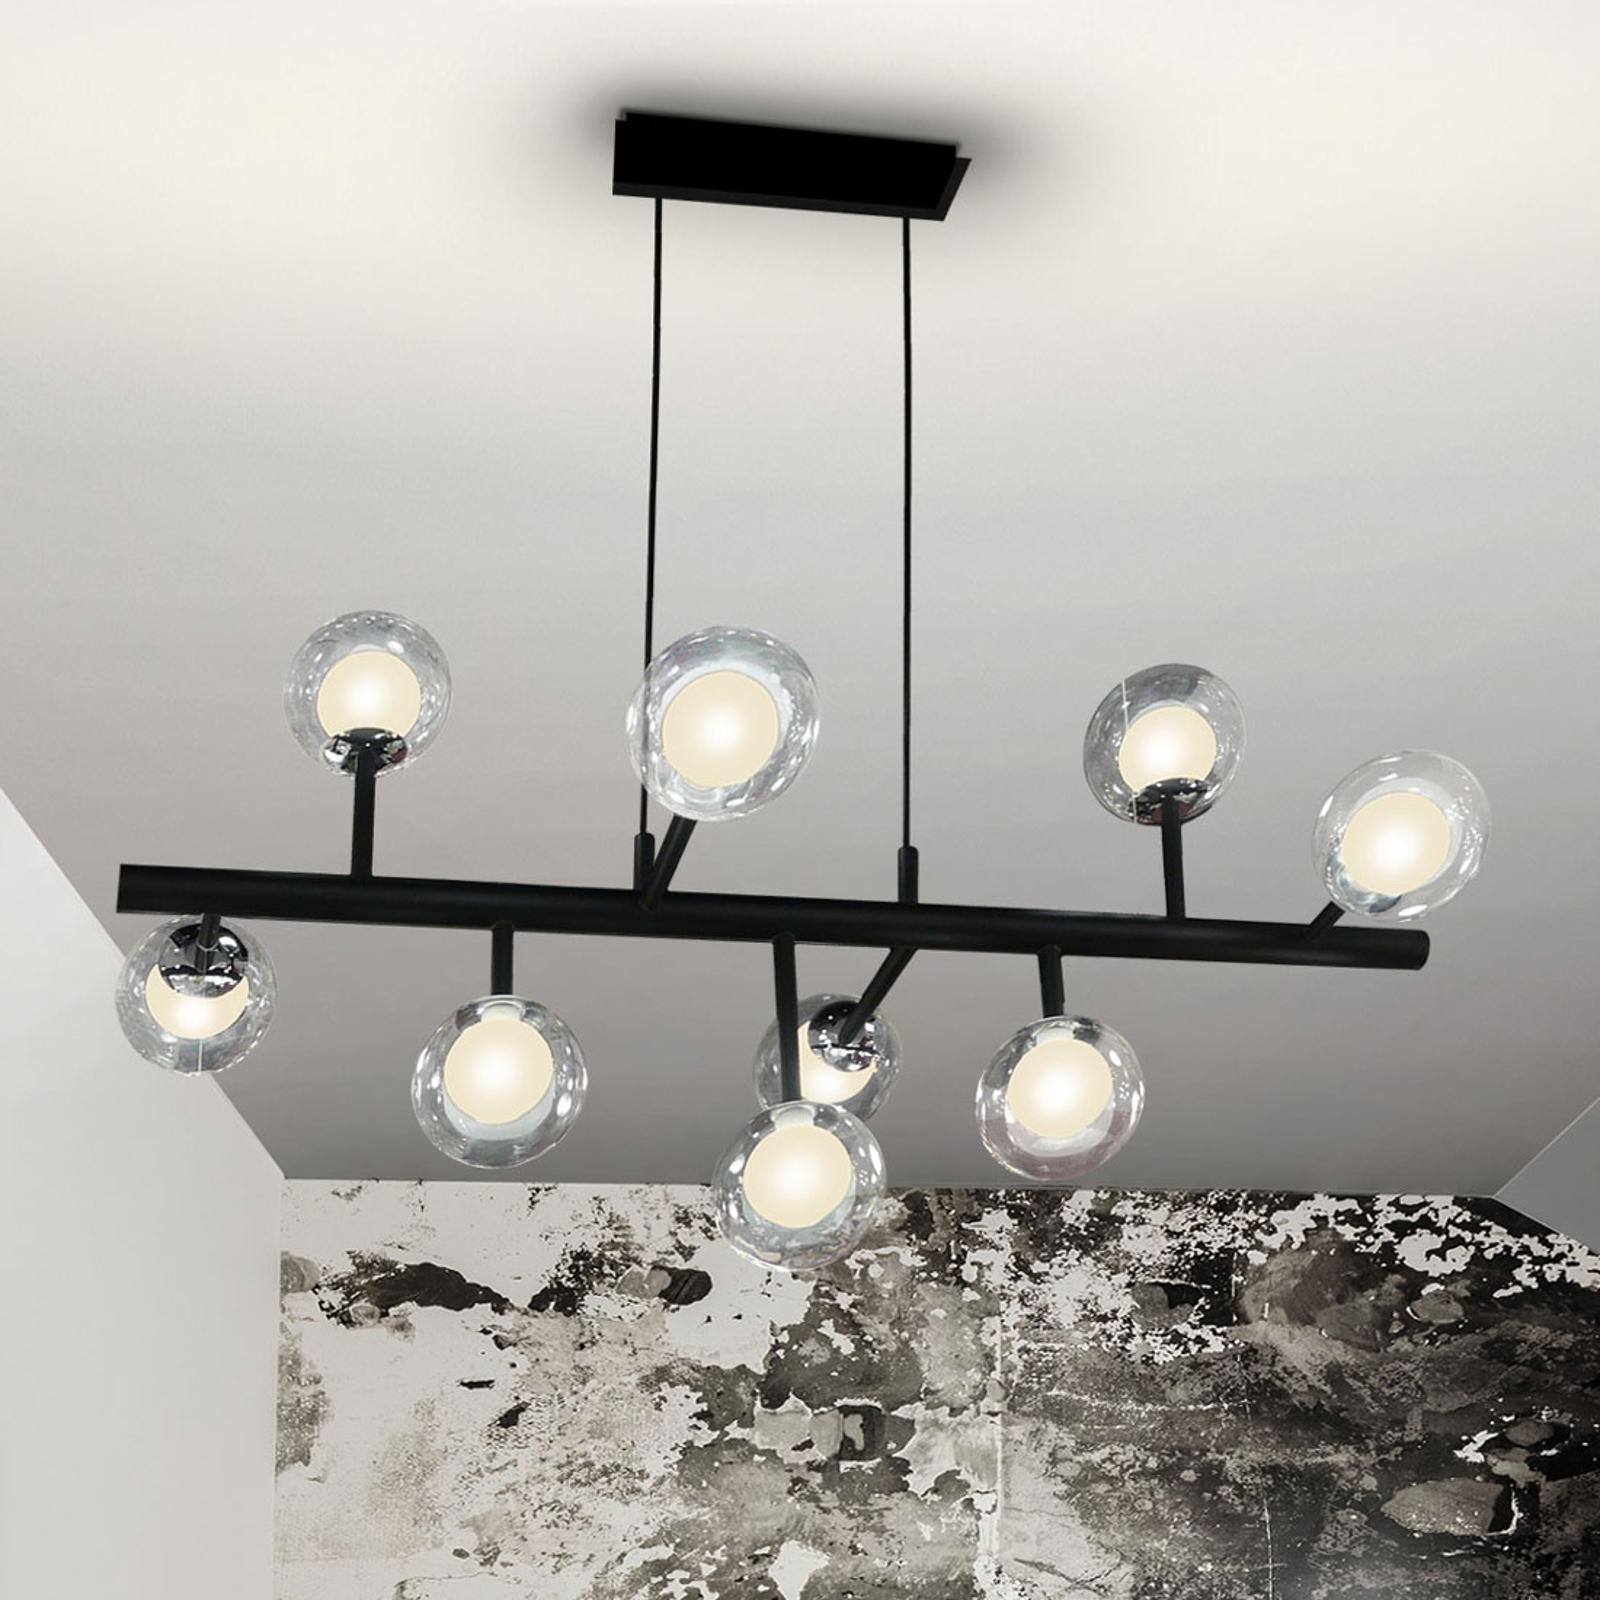 LED hanglamp Altais dimbaar met afstandsbediening